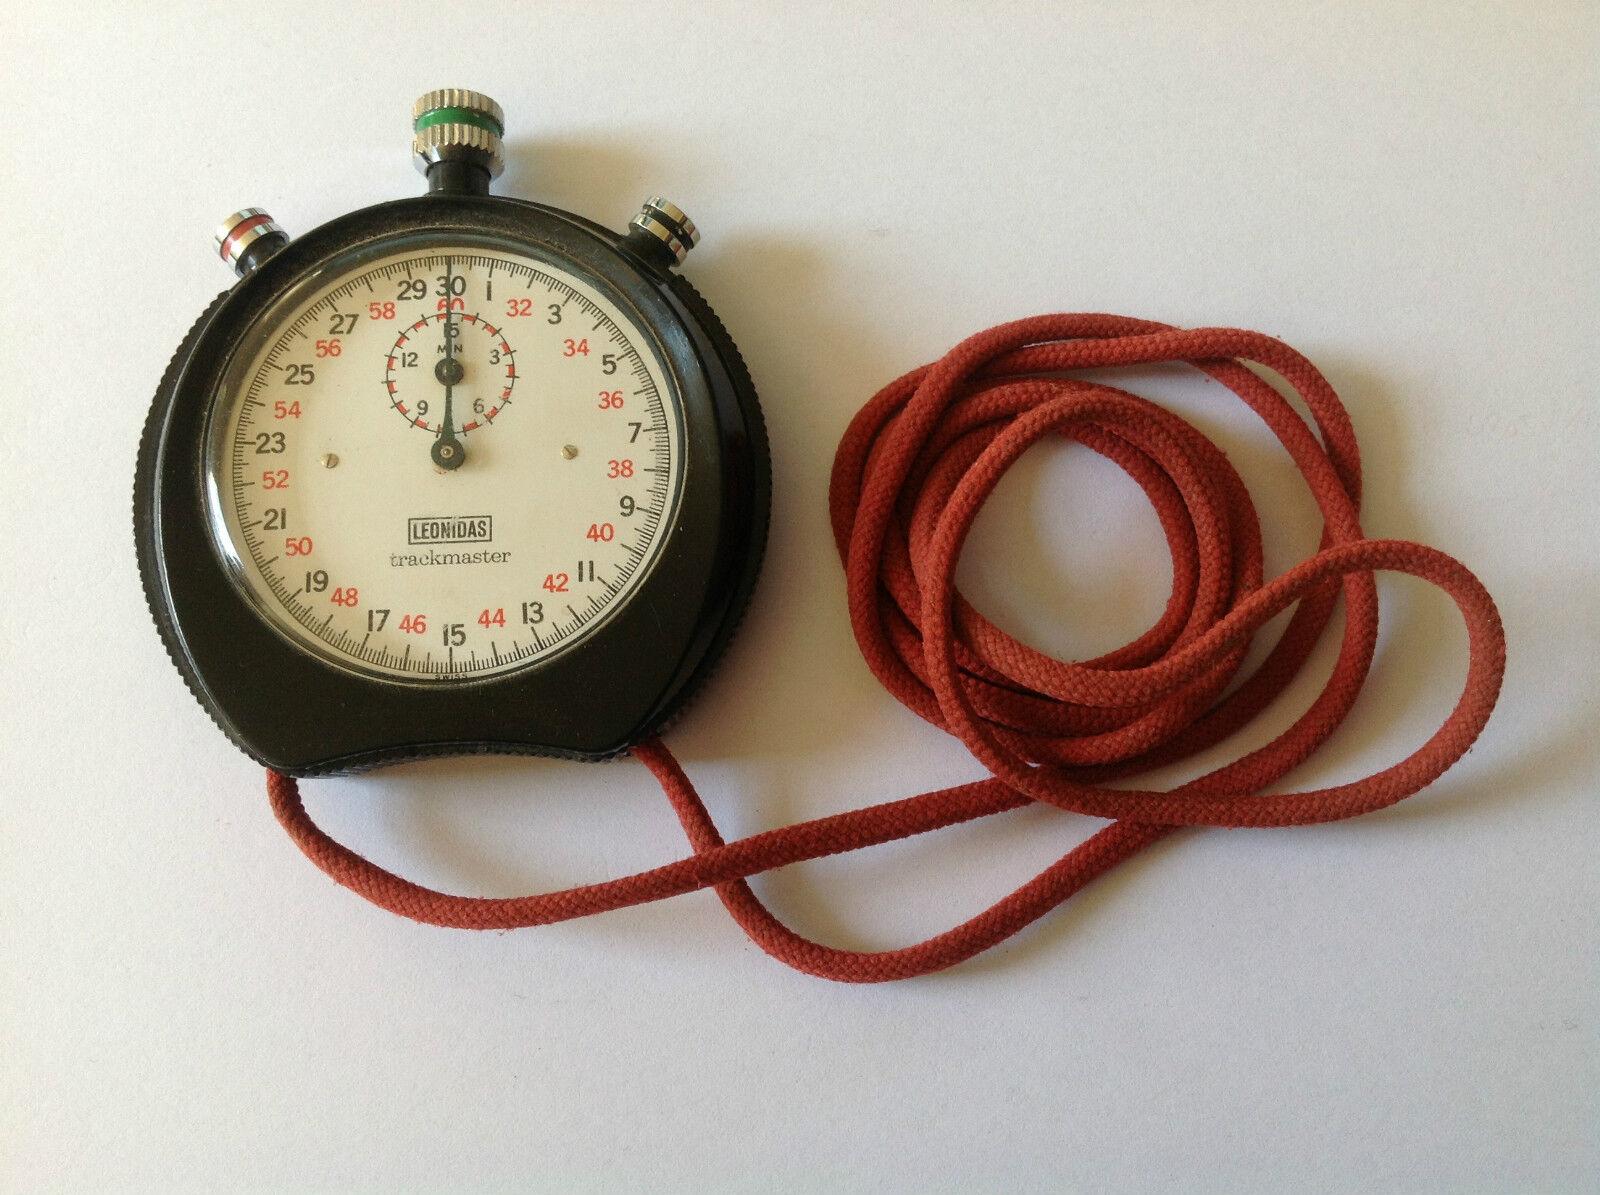 Gebraucht - very rare vintage TrackMaster Leonidas - stoptimer - for Sammler